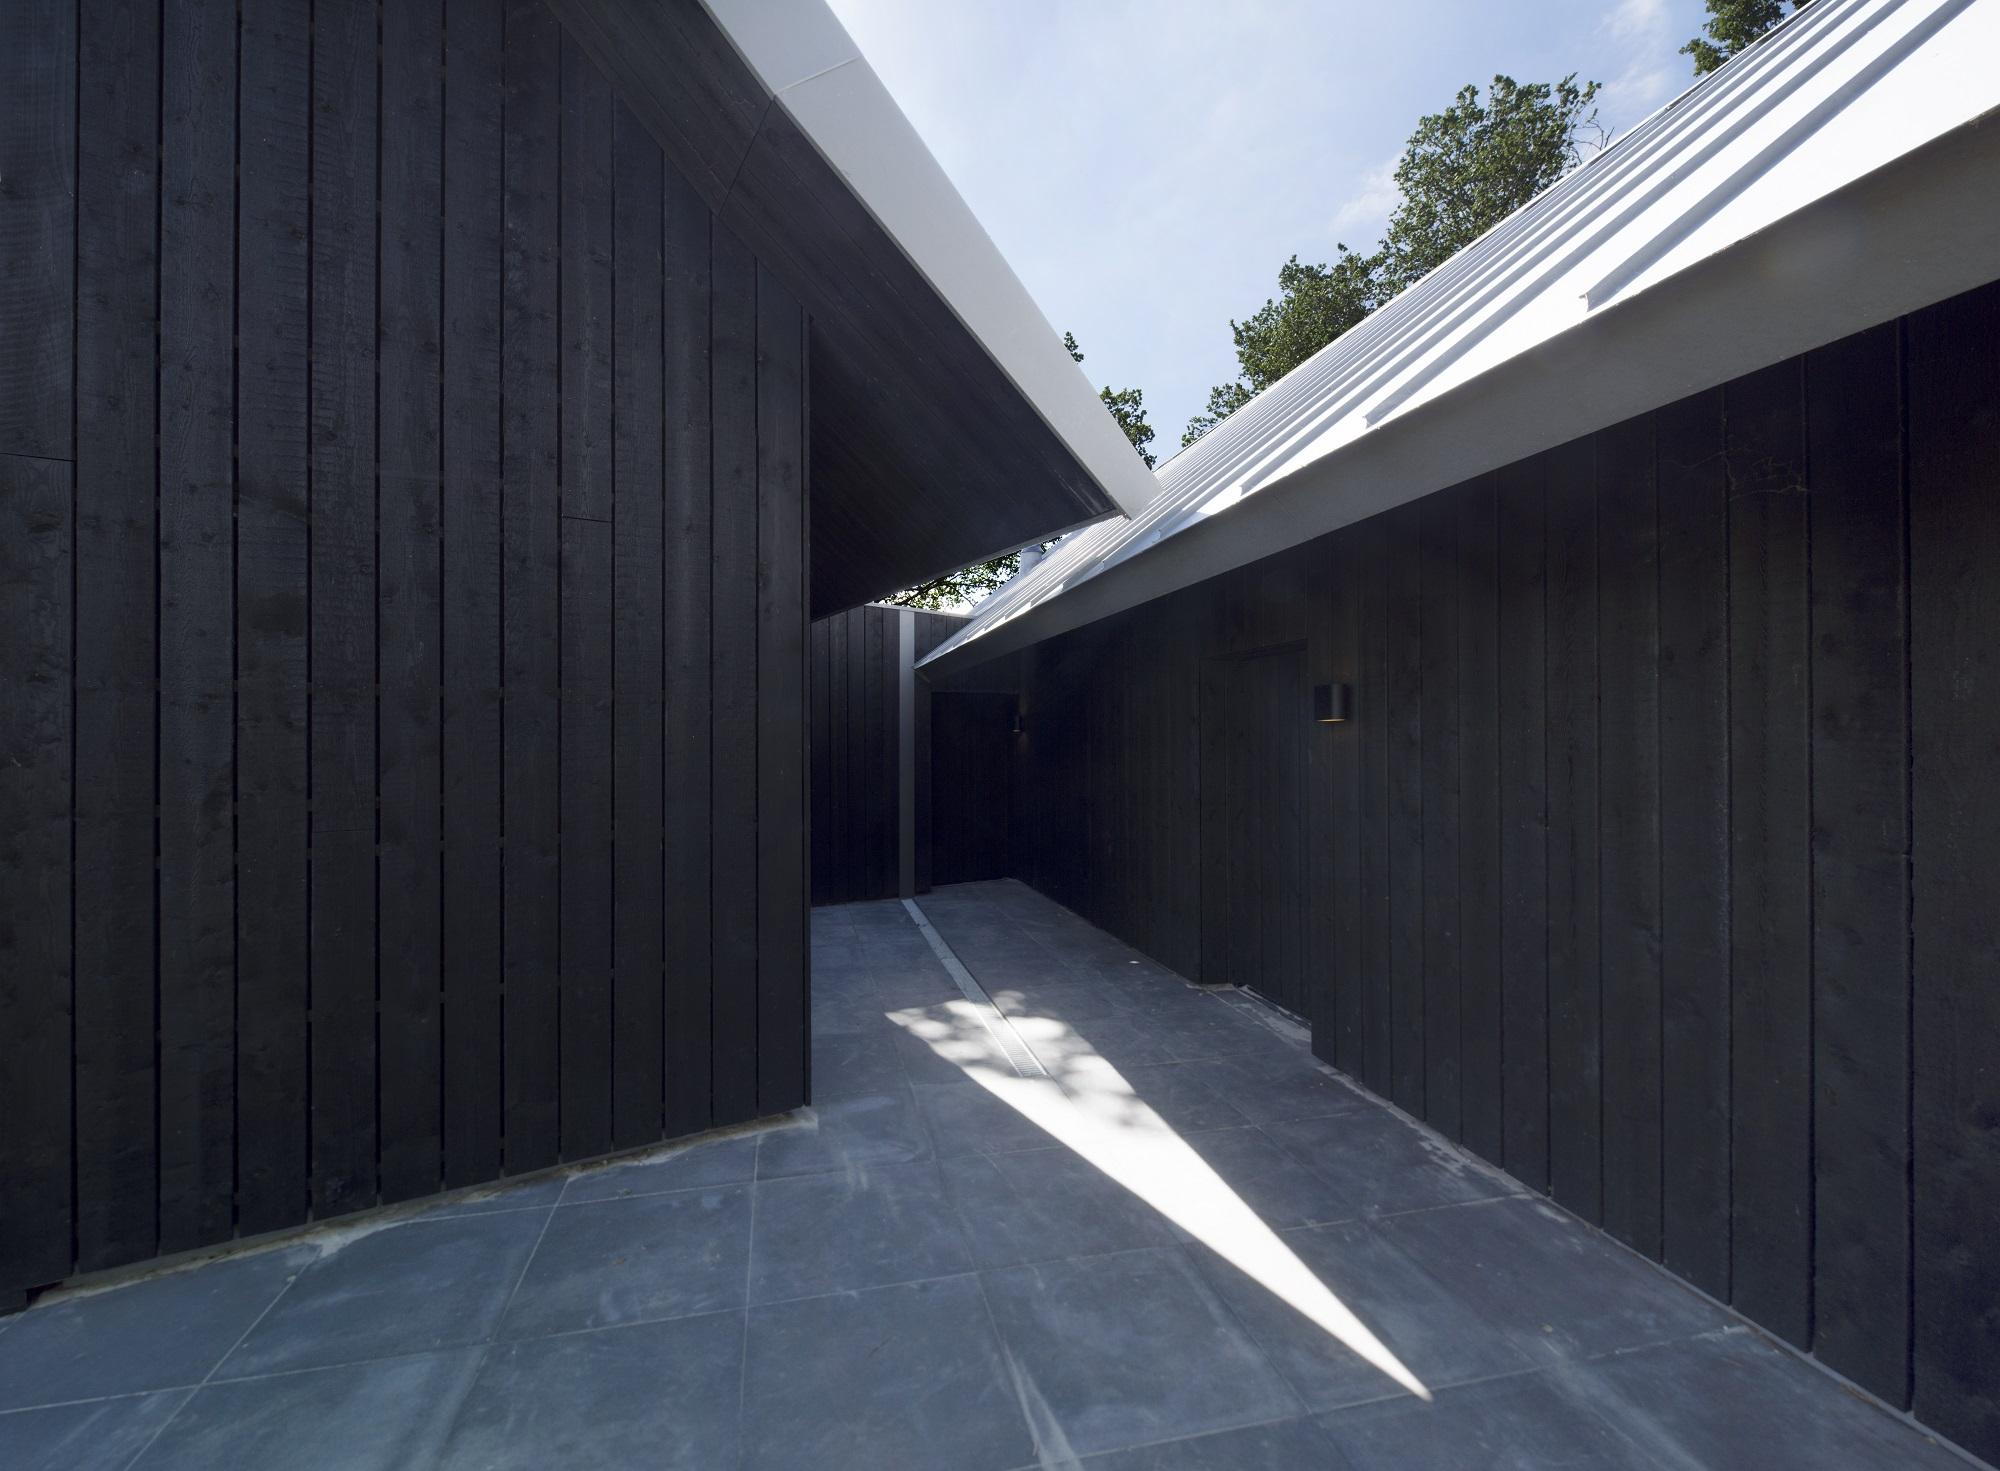 97d34d26ecb Jan Nauta wint Abe Bonnema Prijs 2018 - De Architect